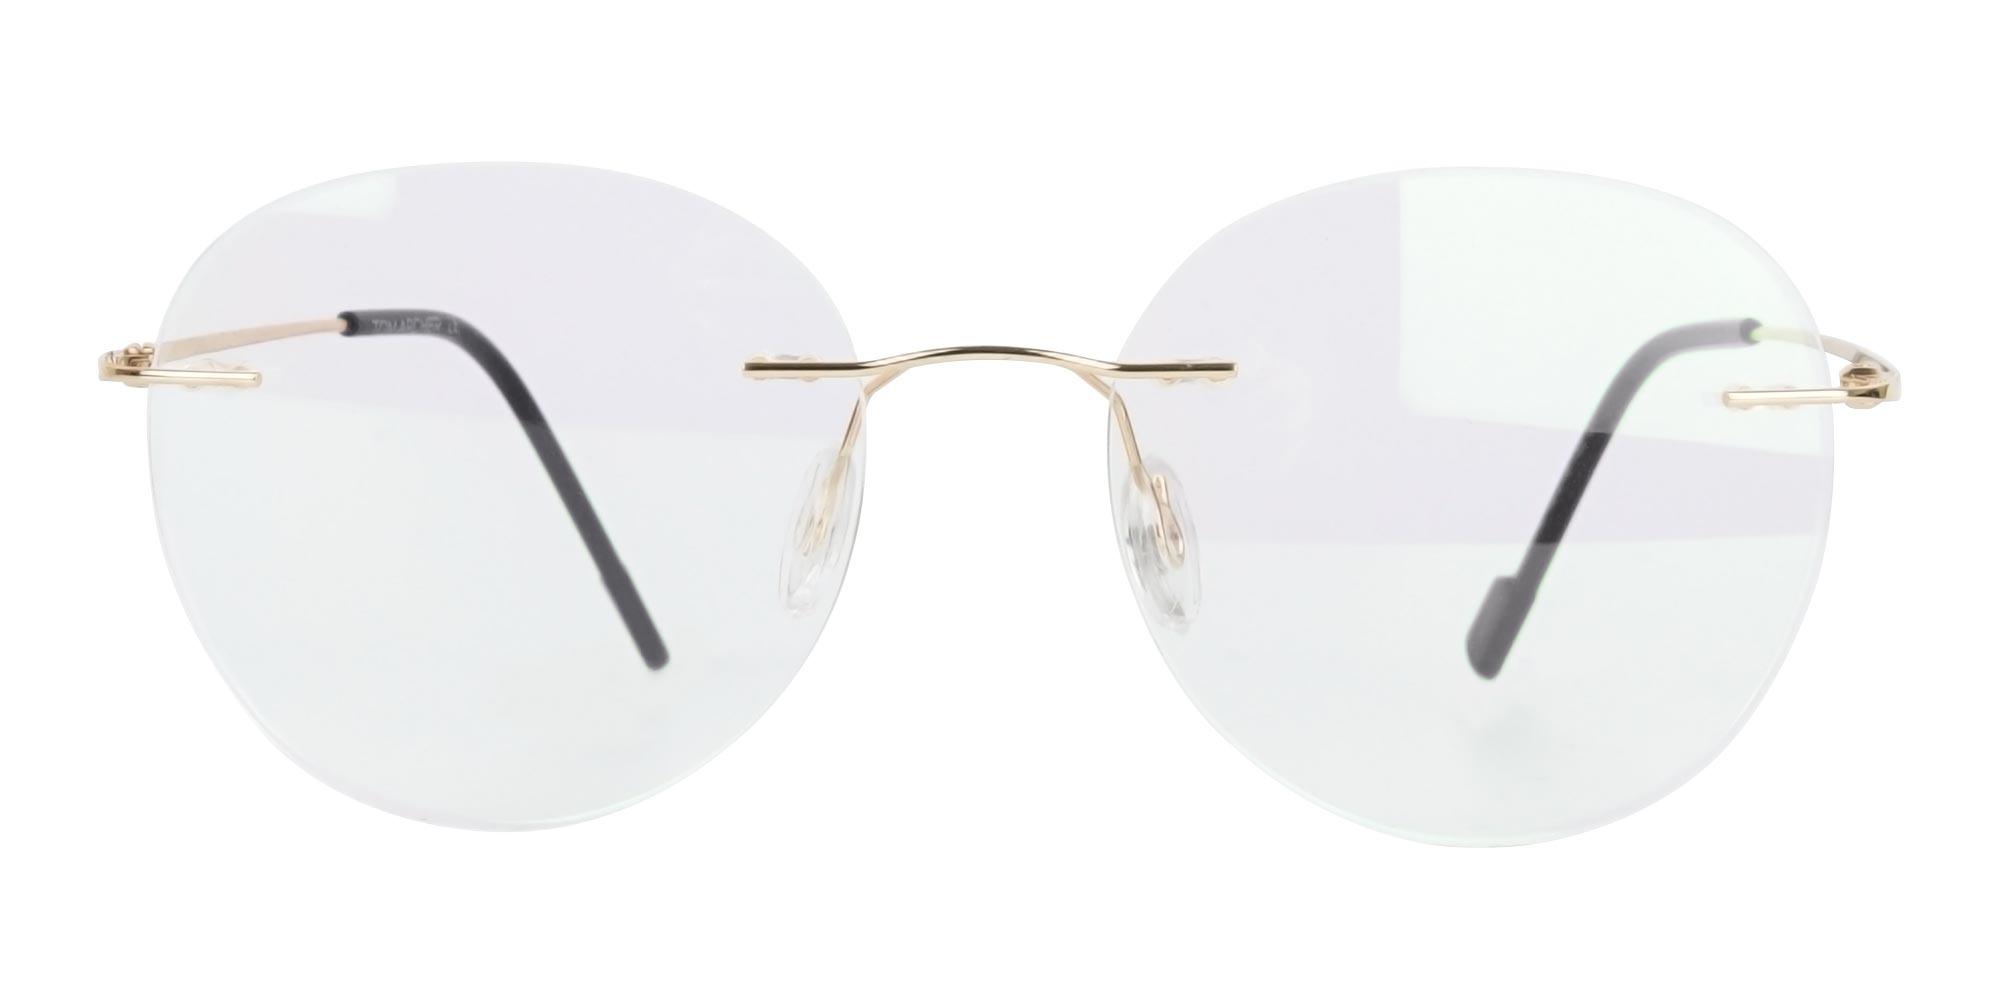 Round Rimlesss Glasses